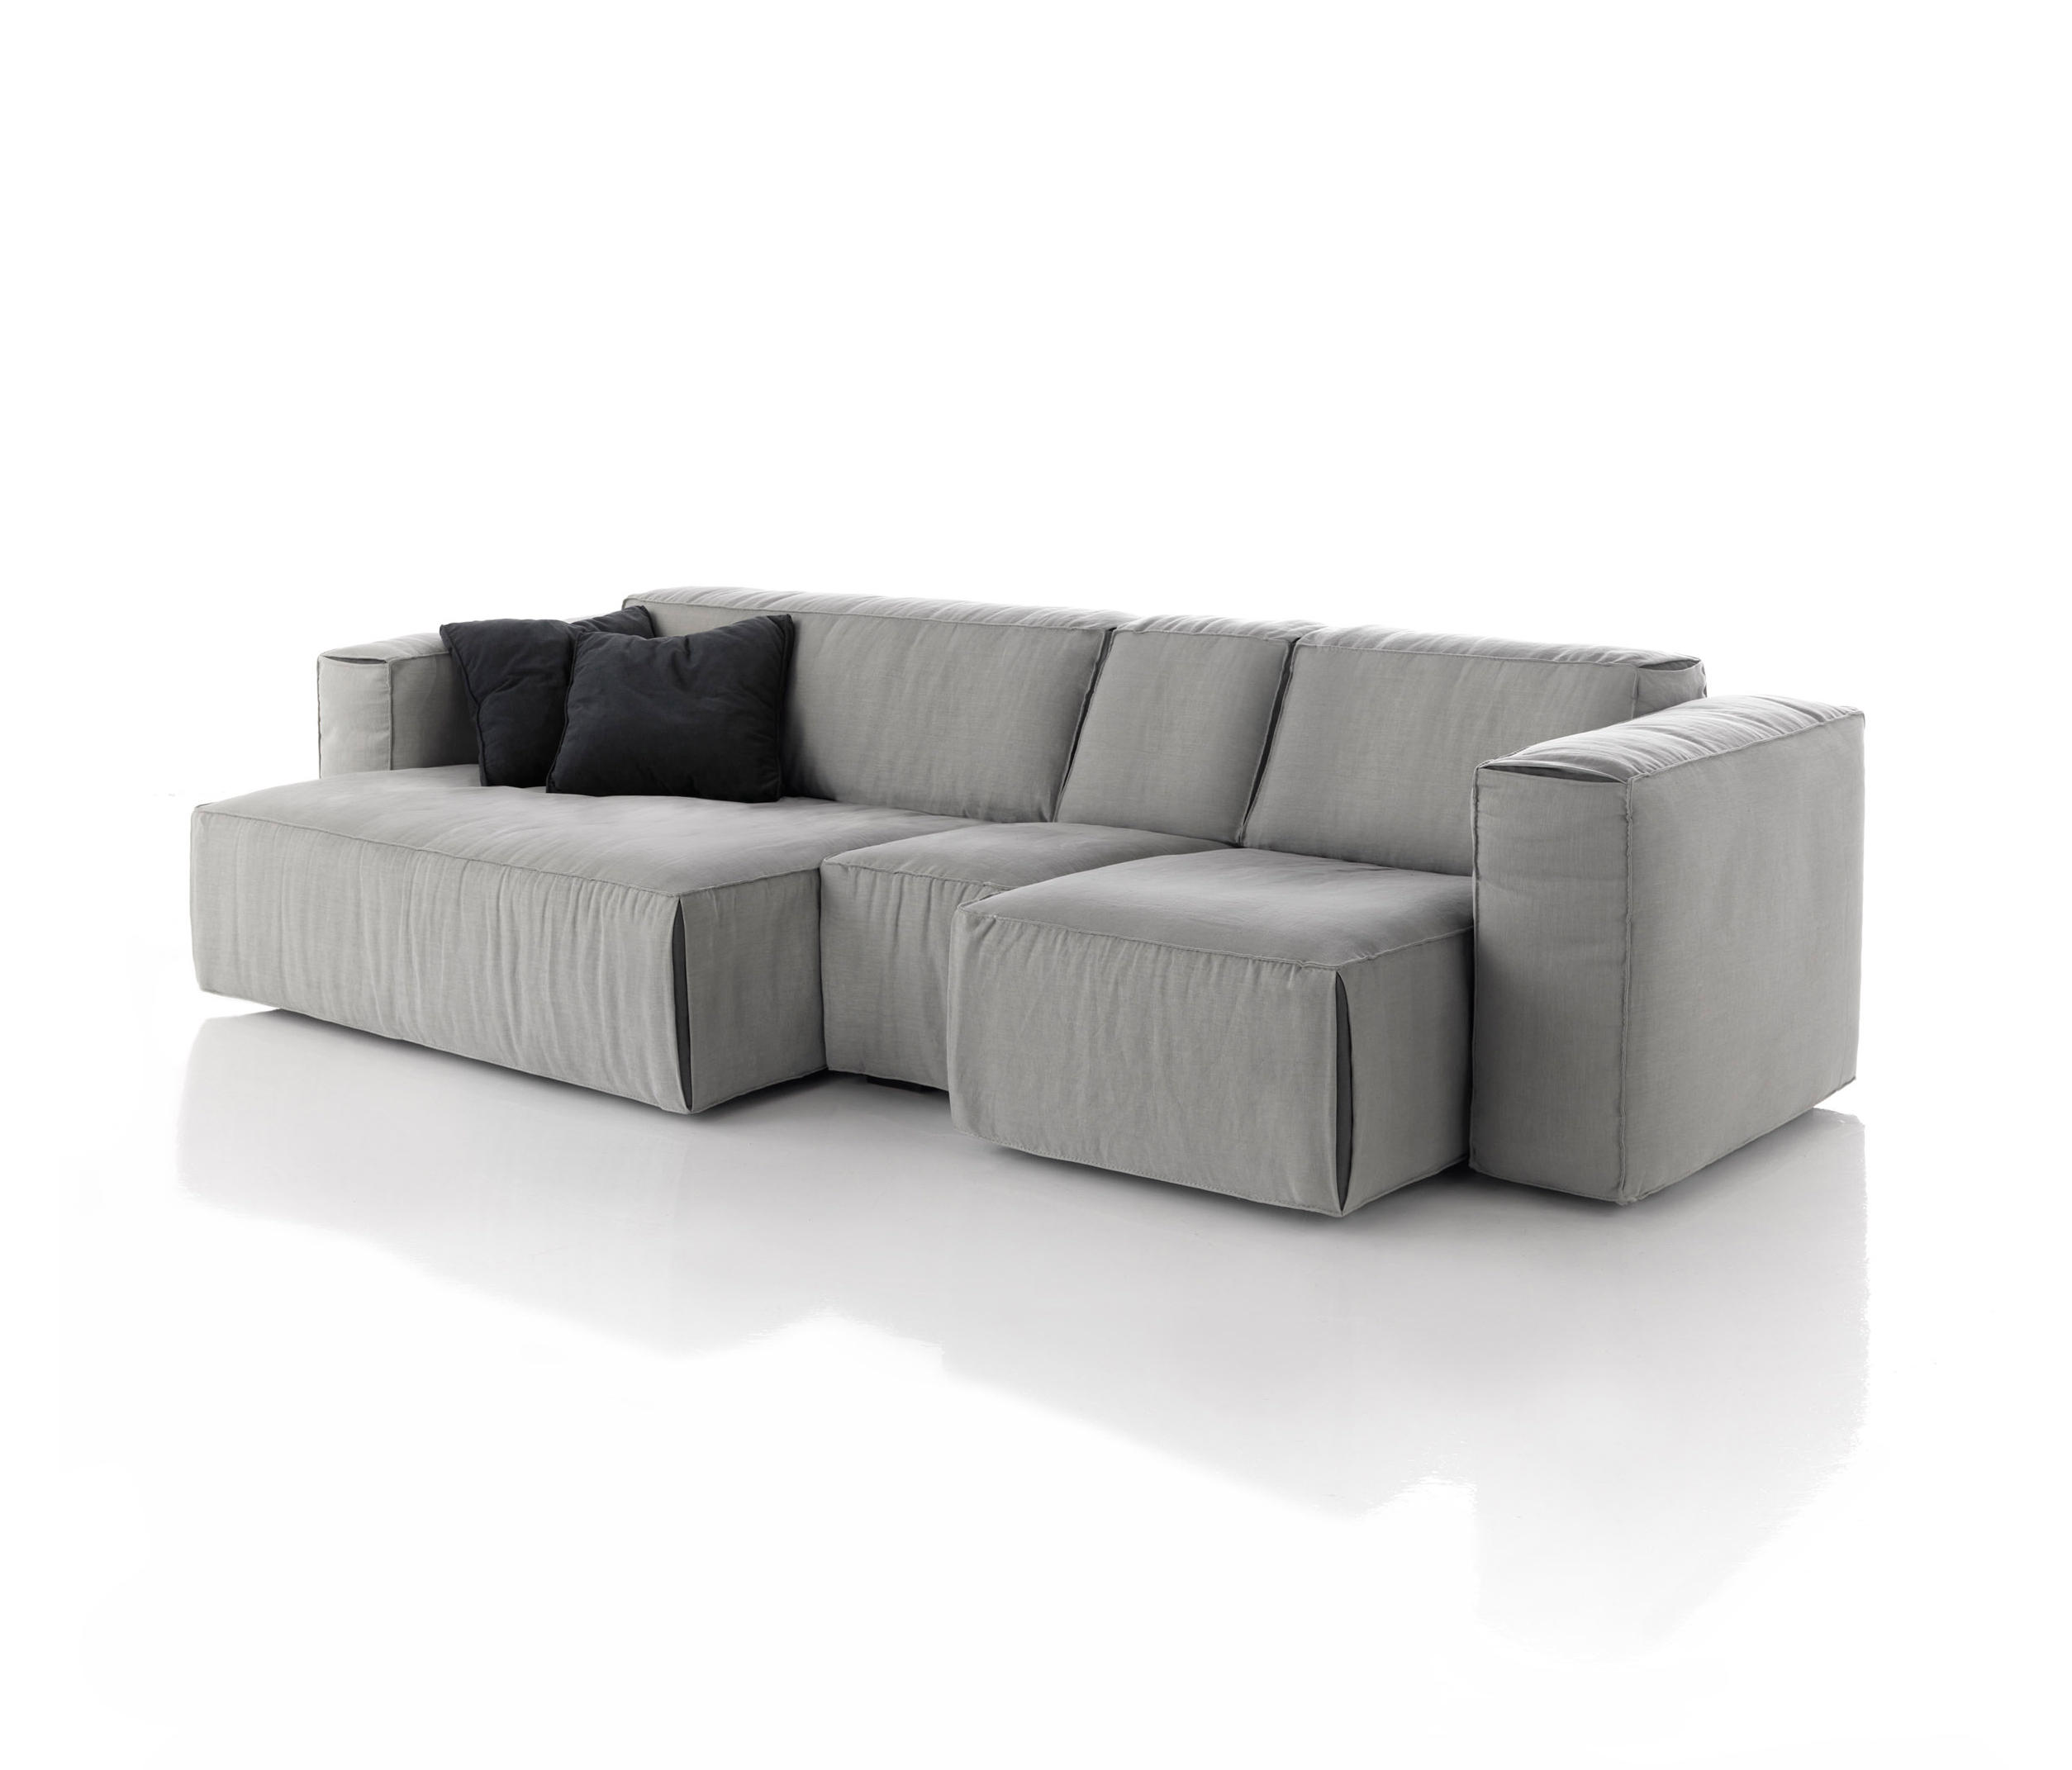 Soft Sofa By Koo International ...